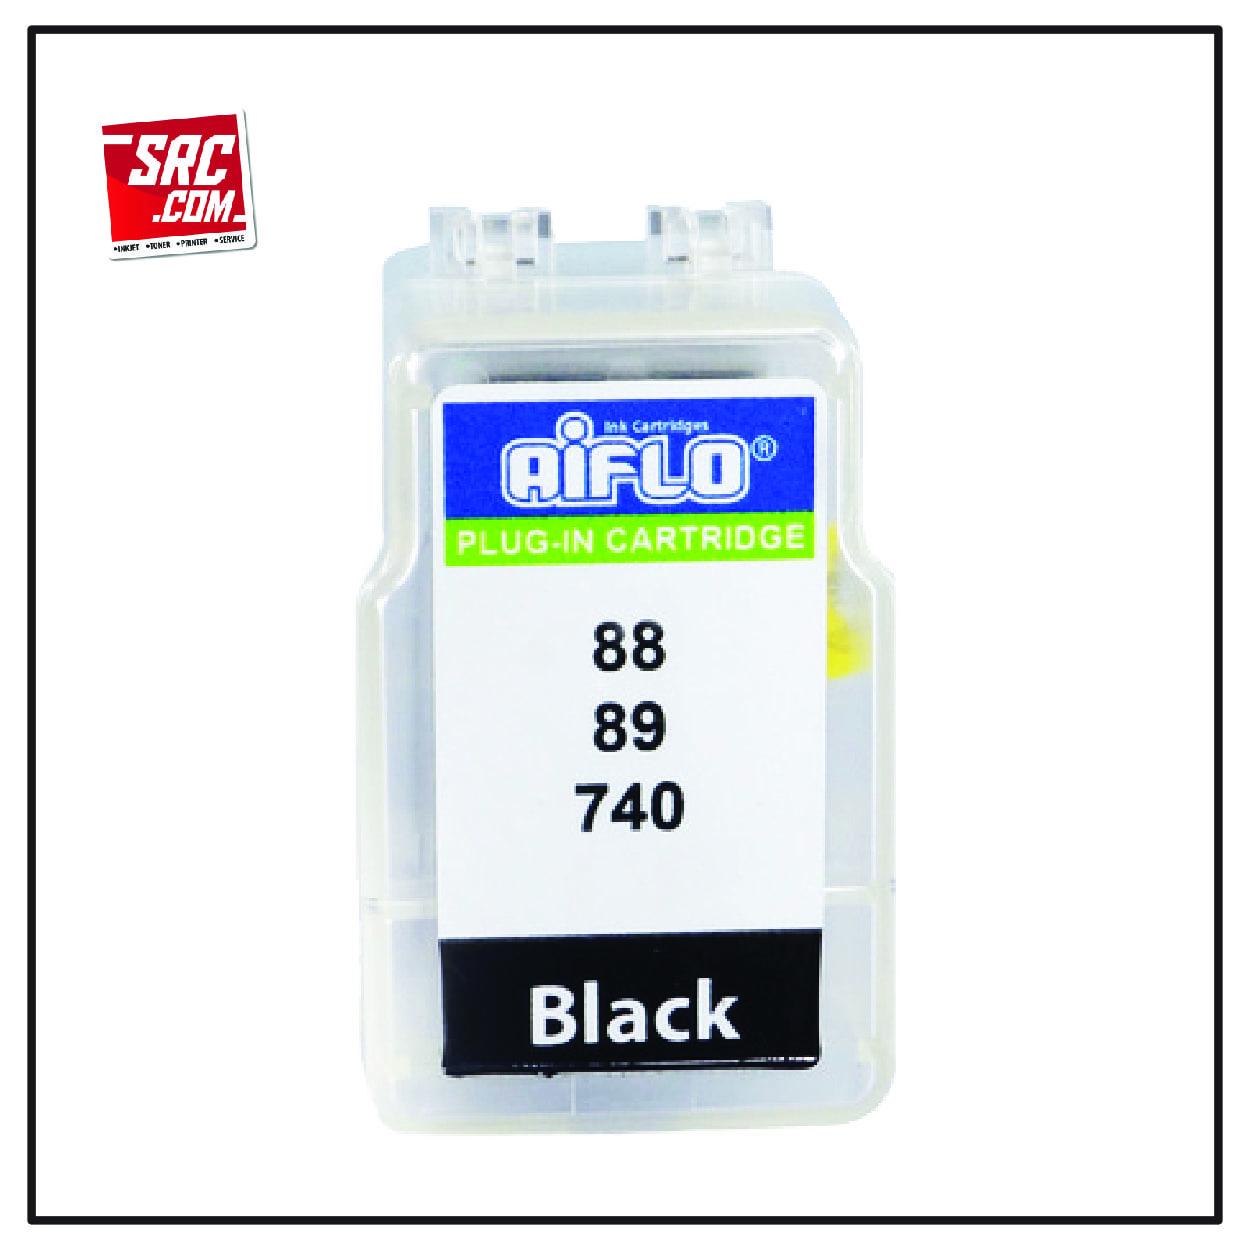 Jual Aiflo Plug In 740 Black Smart Cartridge Printer Inkjet Mg2170 Toner Bekas Brother Tn 2356 E500